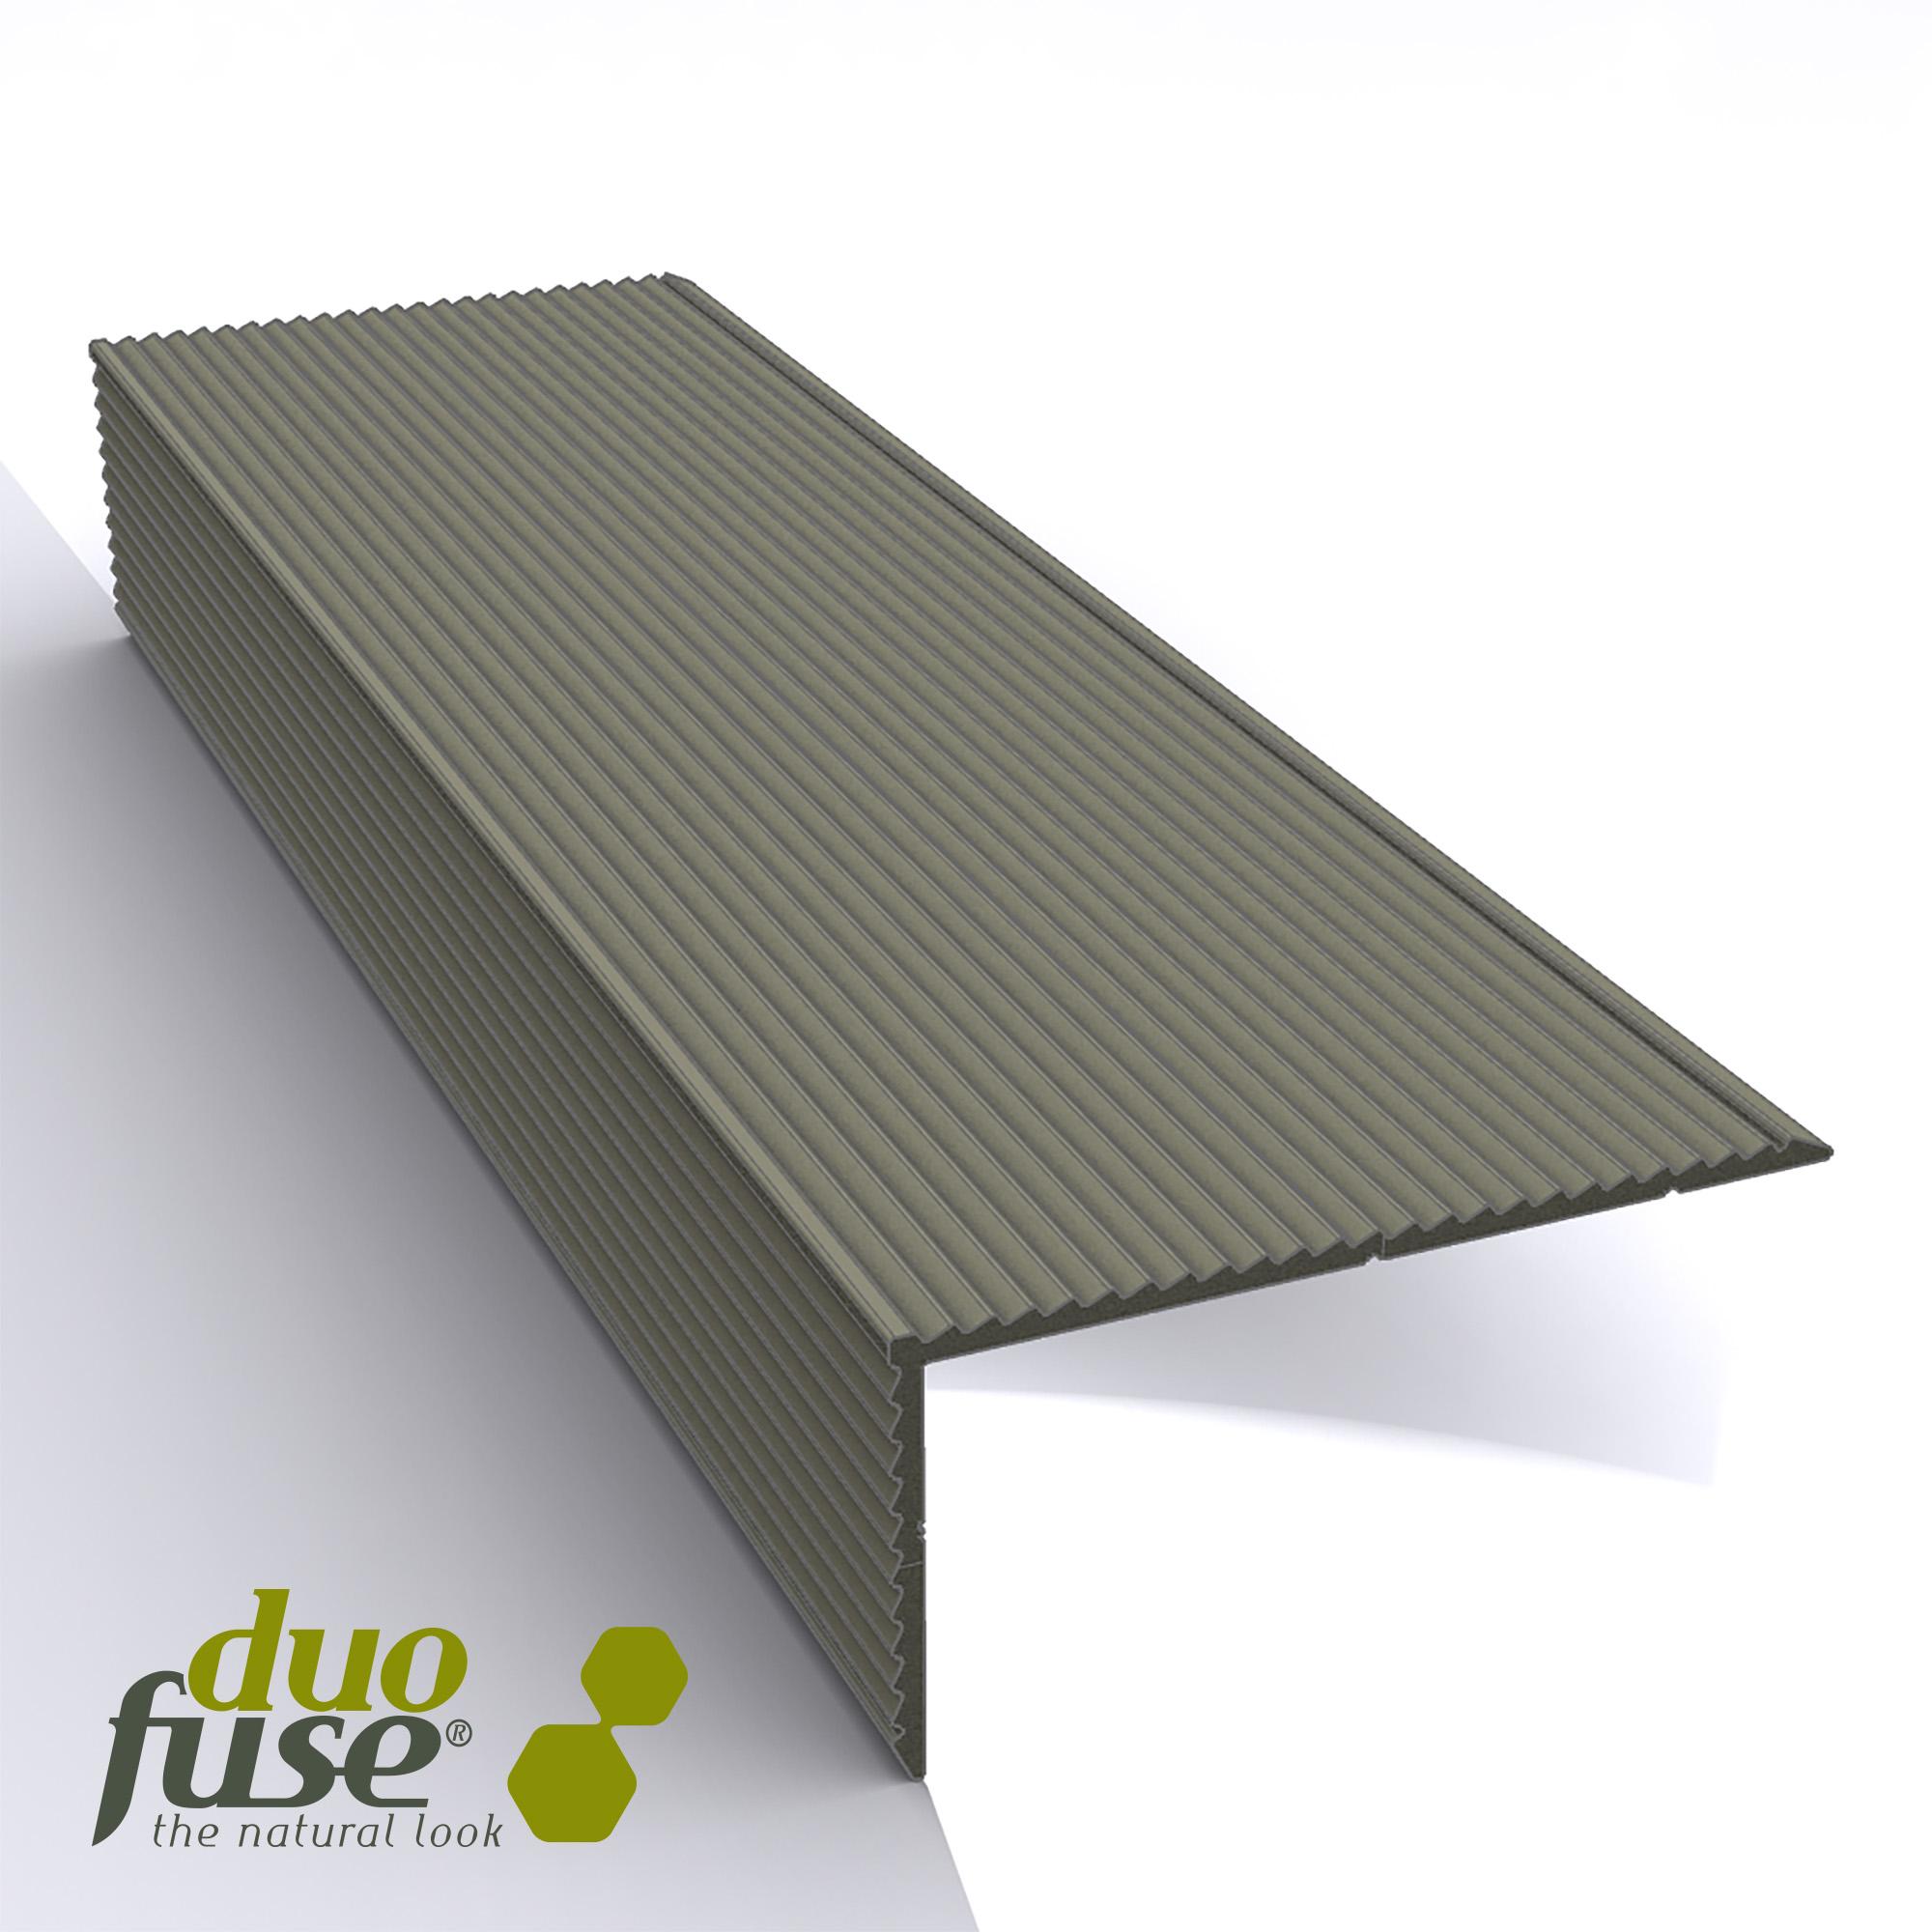 Duofuse | Aluminium L-profiel | 400cm | Tropical Brown